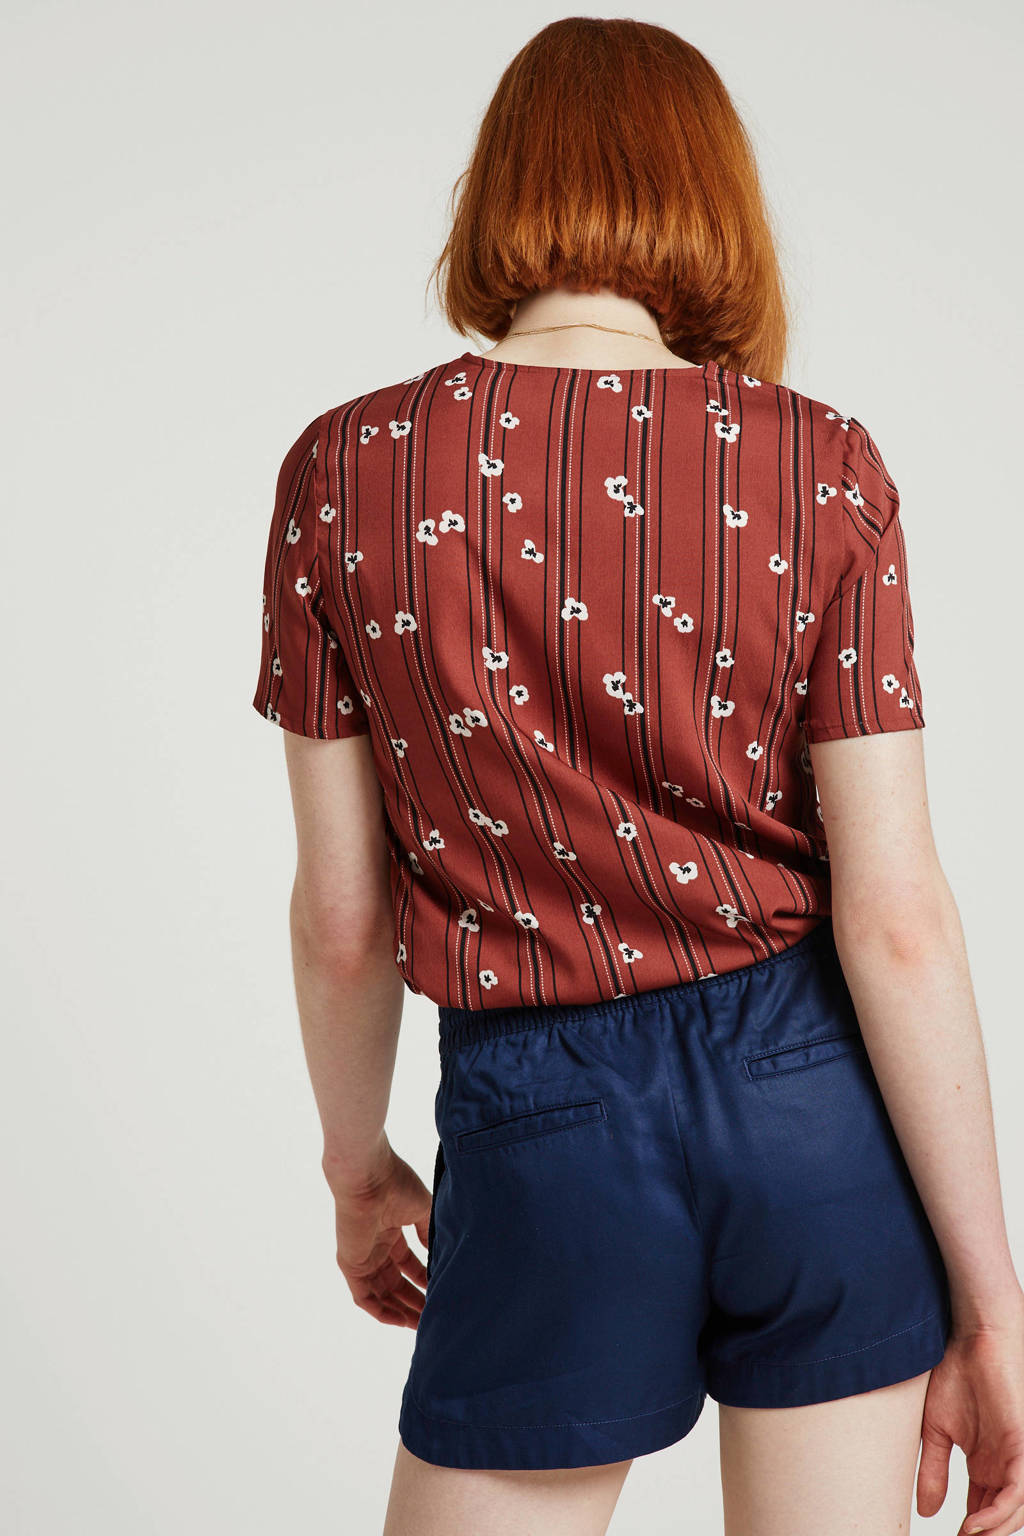 VERO MODA blouse met all over print bruin/zwart/ecru, Bruin/zwart/ecru